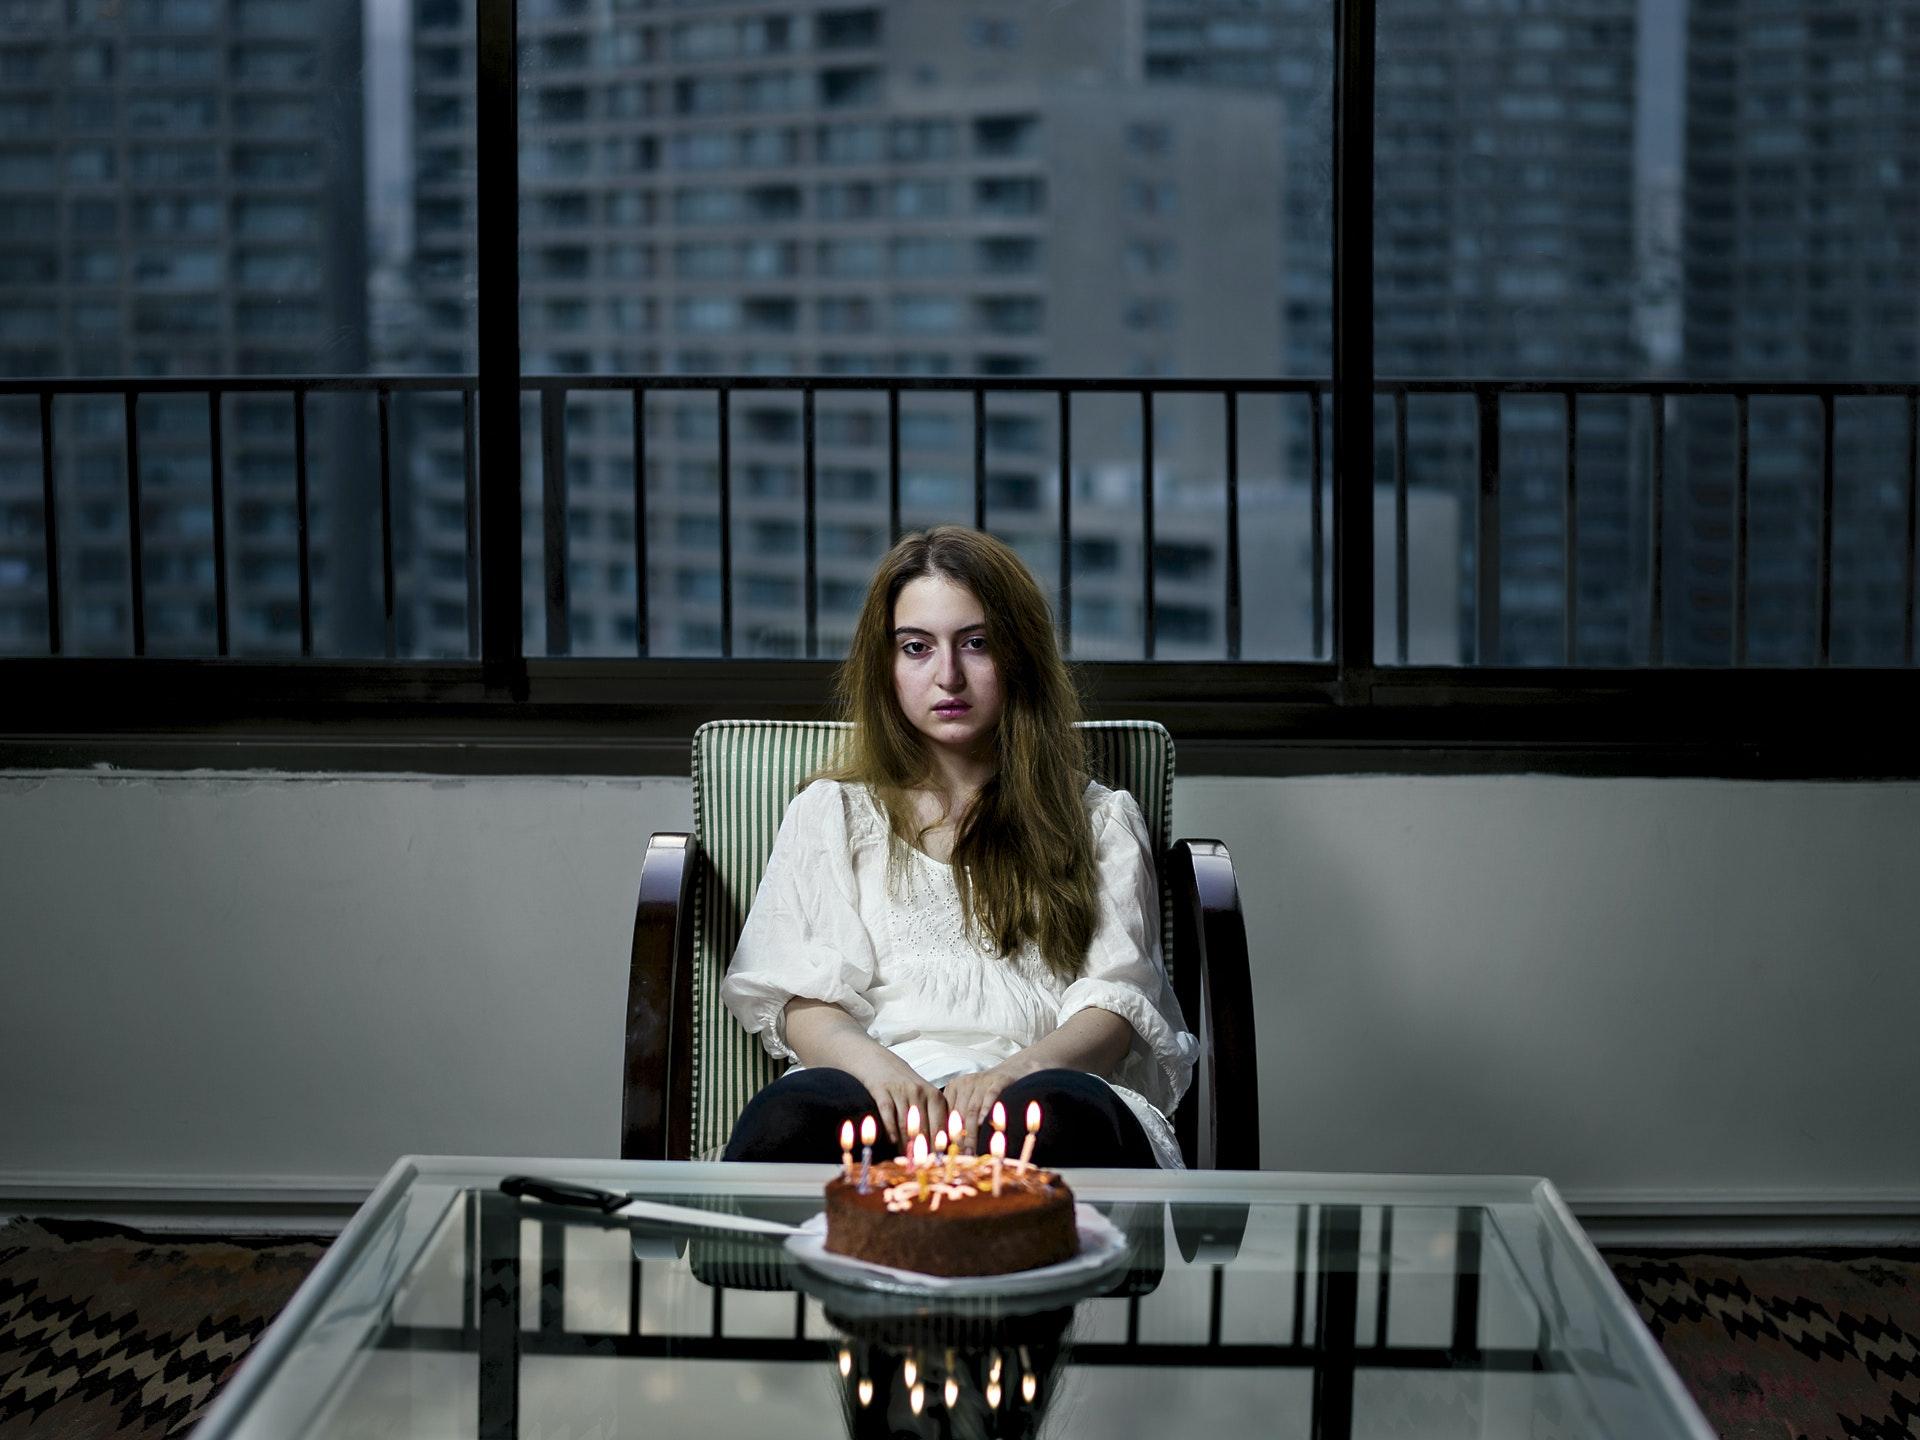 7-©Newsha-Tavakolian-Regard